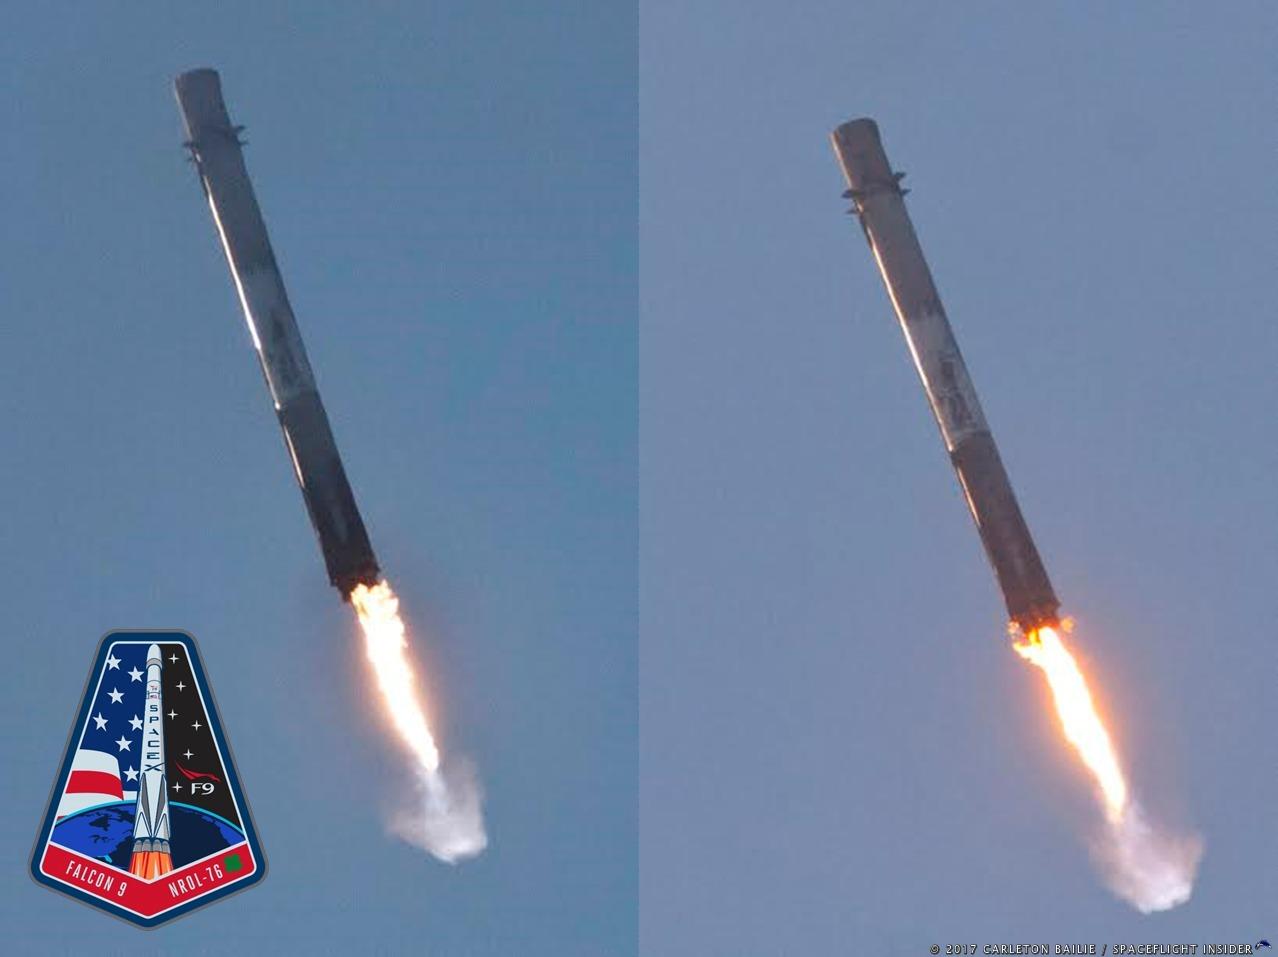 http://www.spaceflightinsider.com/wp-content/gallery/nrol-76-falcon-9/10769-spacex_falcon_9_nrol76-carleton_bailie-1.jpg